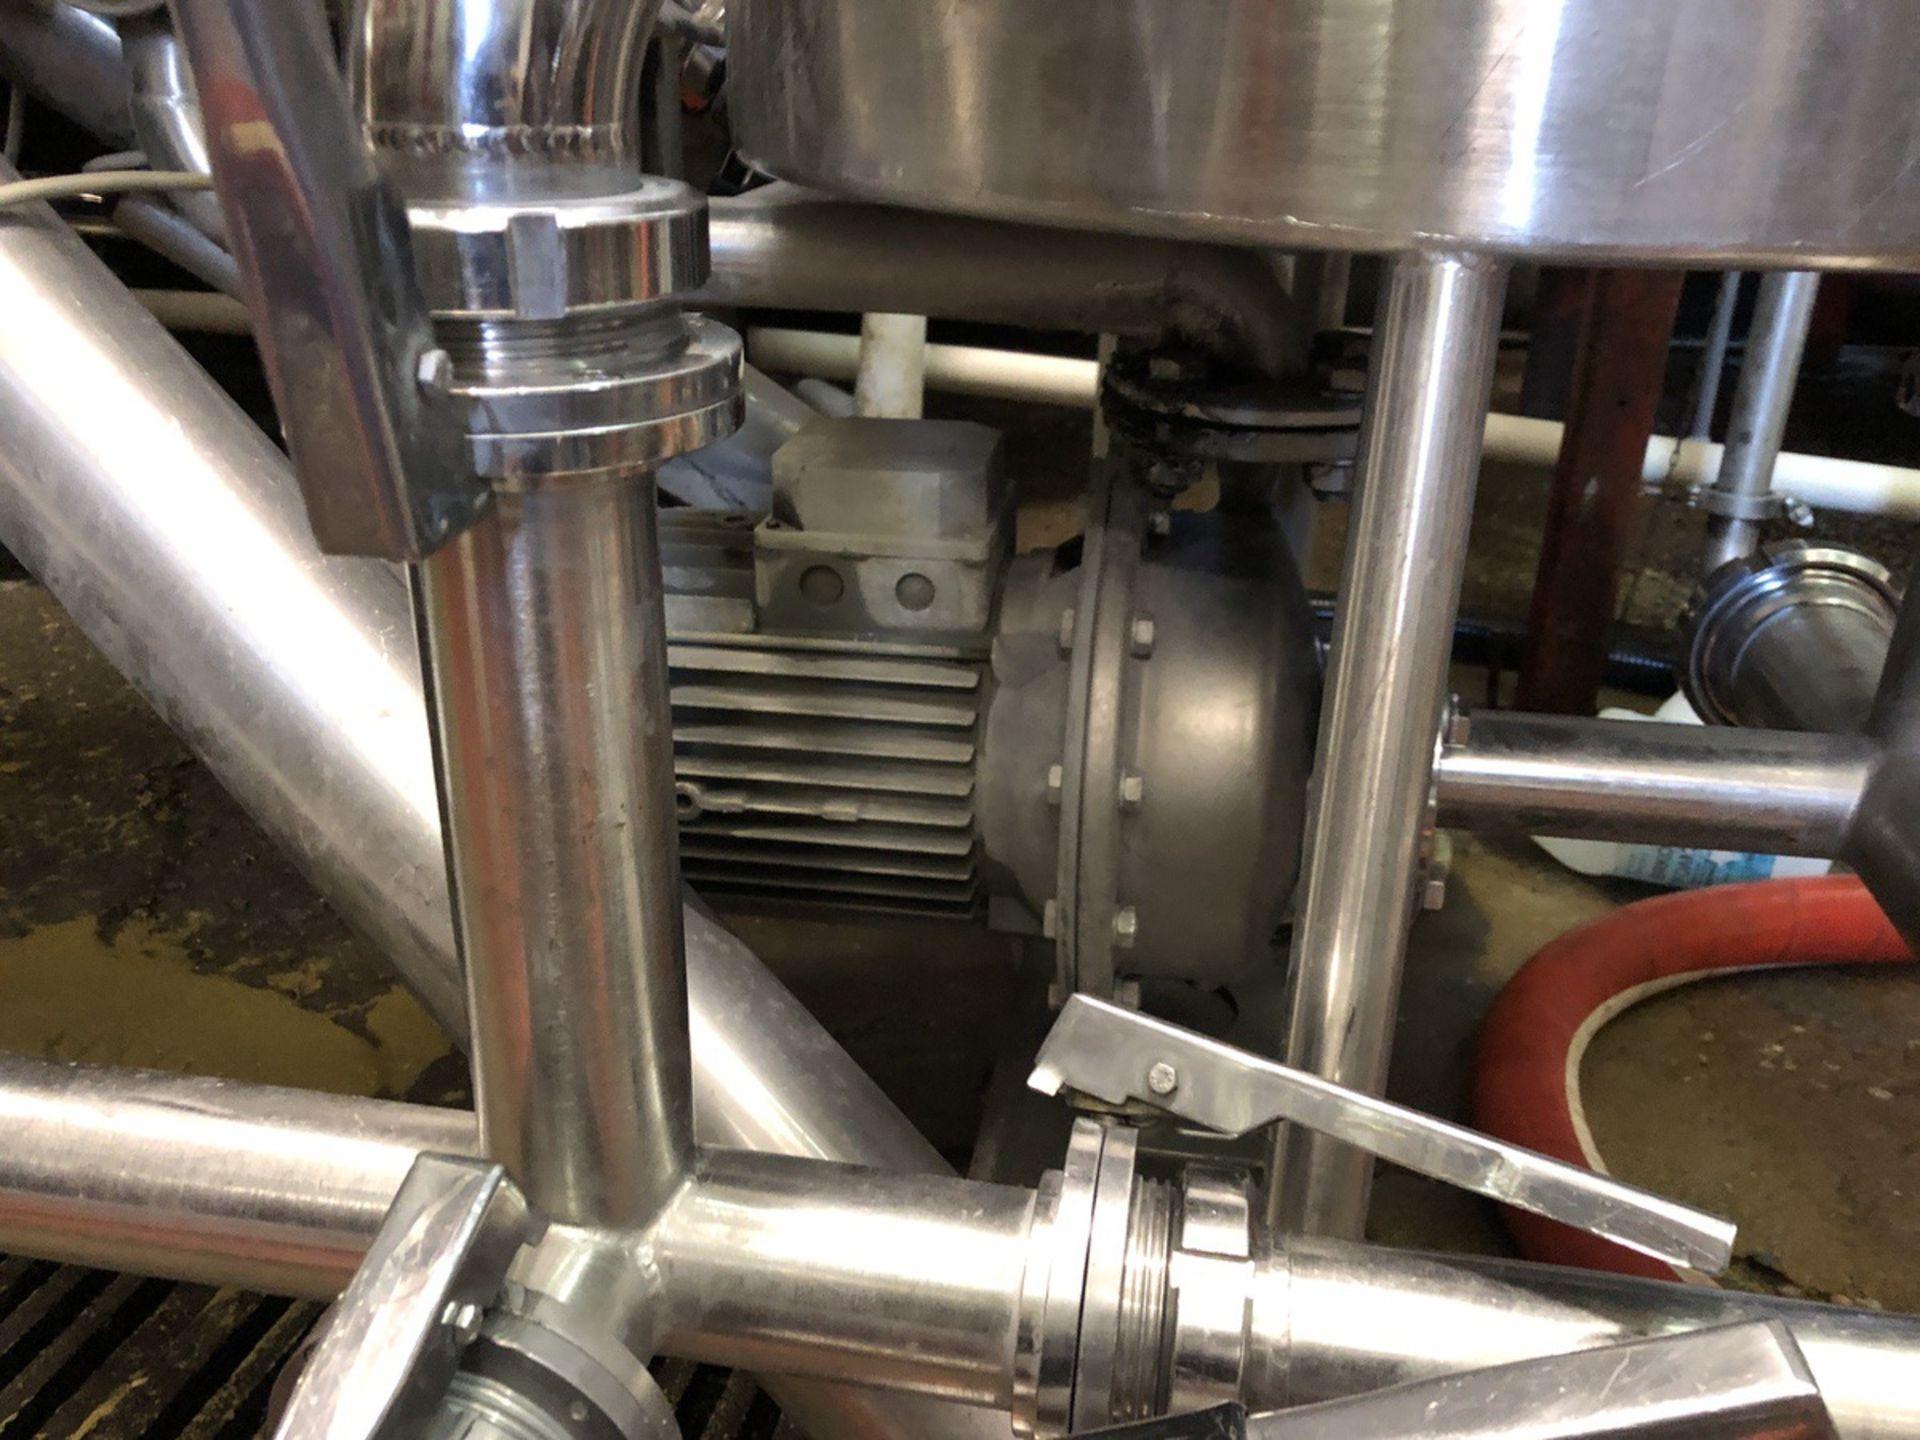 Lot 29 - 2006 Velo Model FVF 10 DE Filter, S/N: V0014284 | Rig Fee: $275